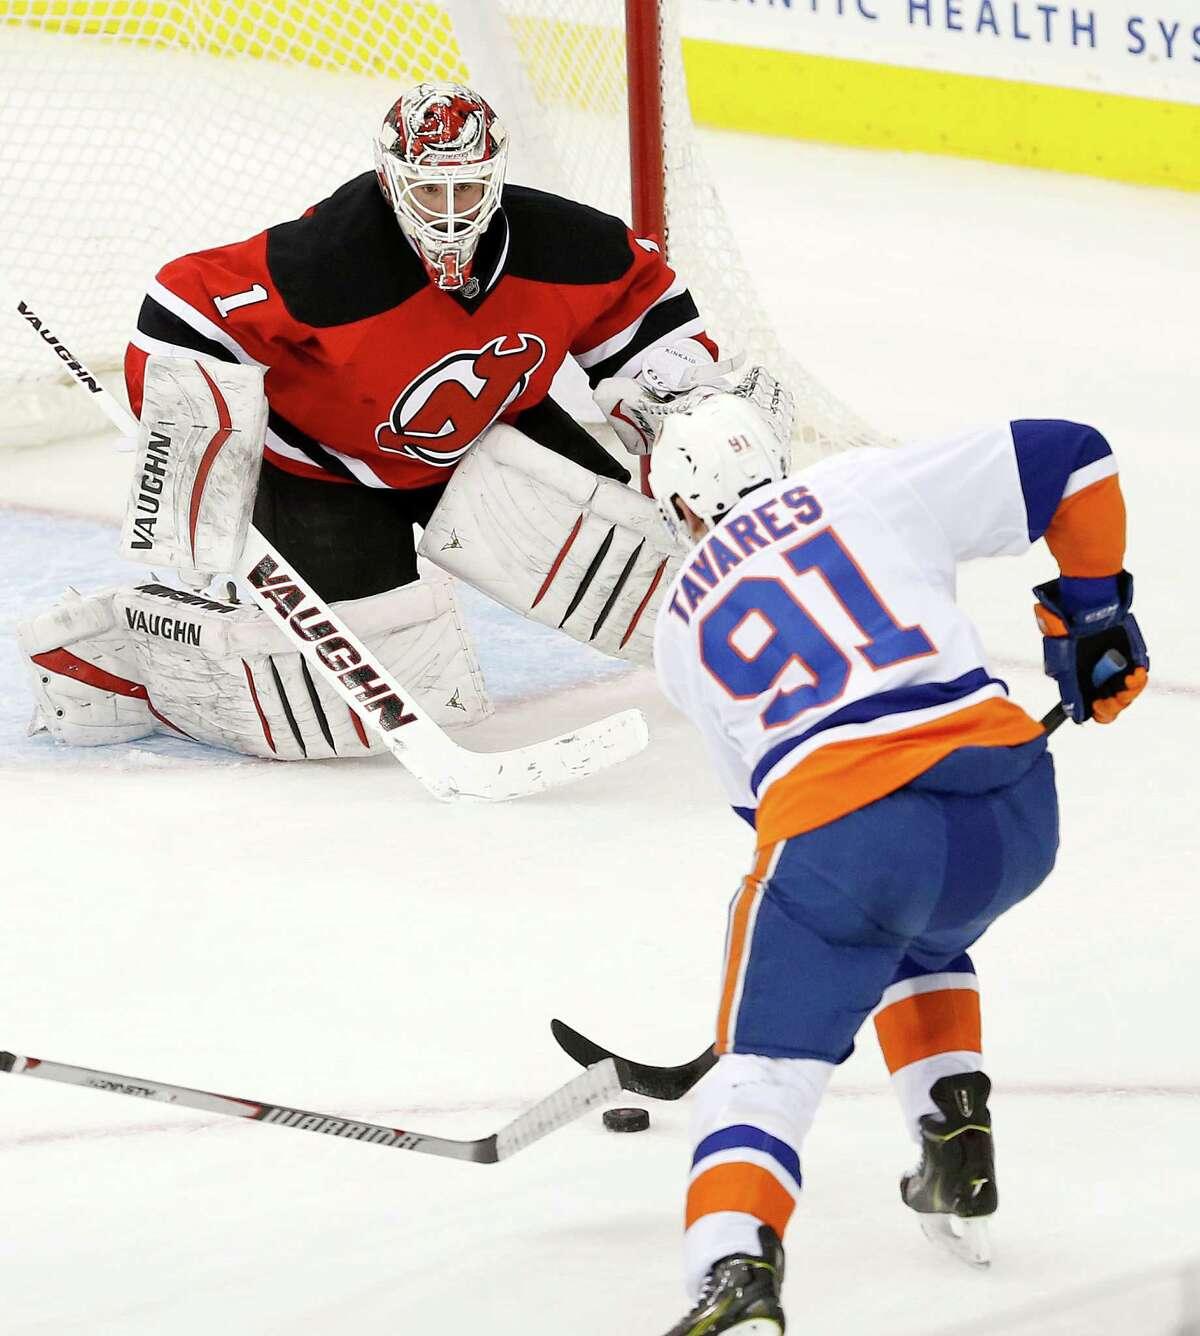 New York Islanders center John Tavares (91) scores a game-winning goal against New Jersey Devils goalkeeper Keith Kinkaid (1) during overtime of an NHL hockey game, Friday, Jan. 9, 2015, in Newark, N.J. The Islanders won 3-2. (AP Photo/Julio Cortez) ORG XMIT: NJJC124